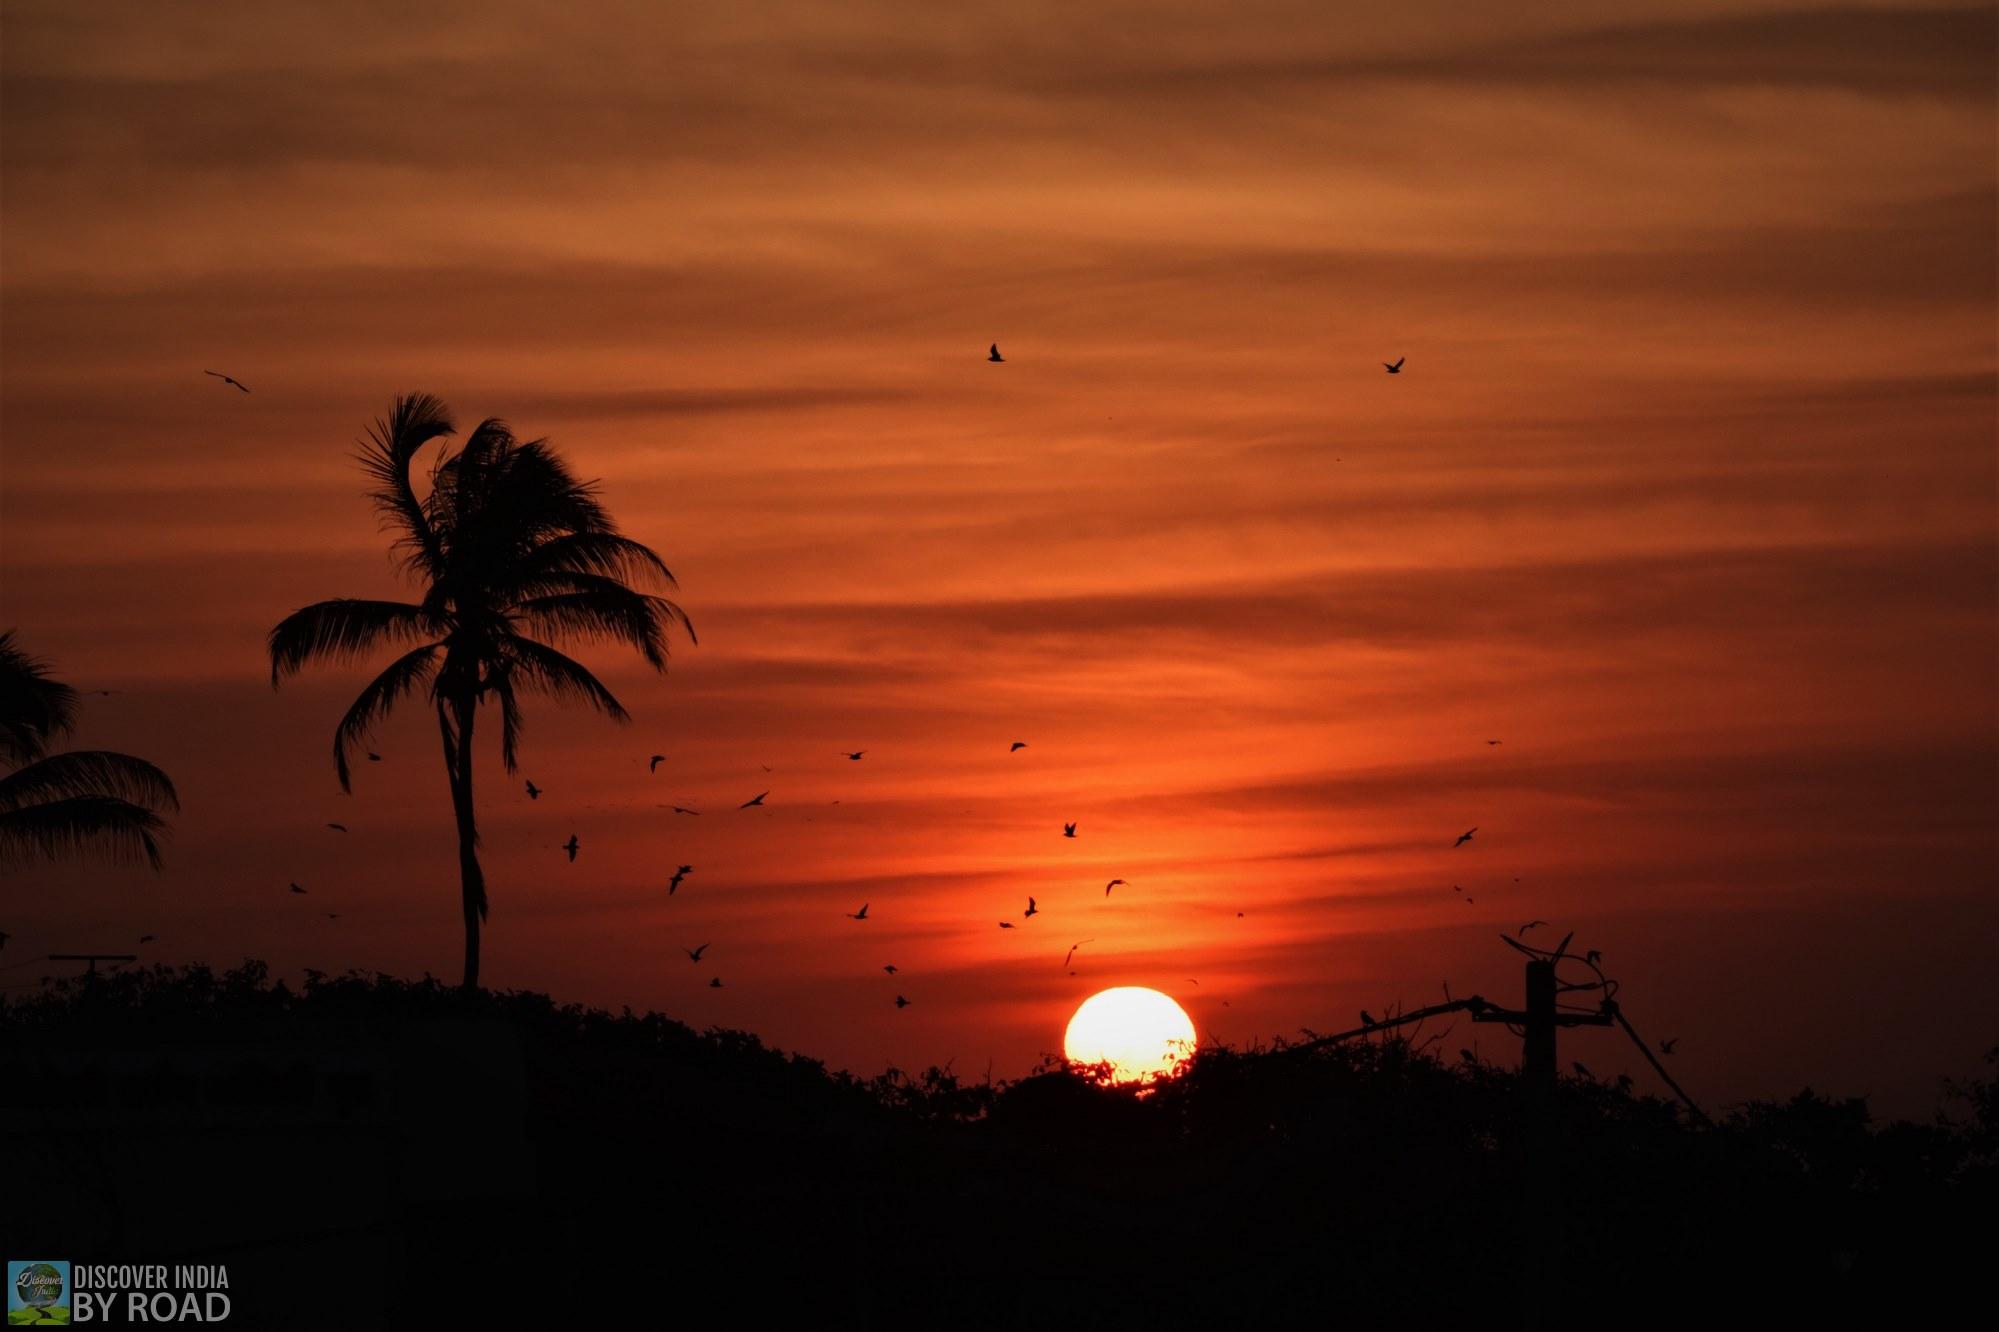 Sunrise in Somnath